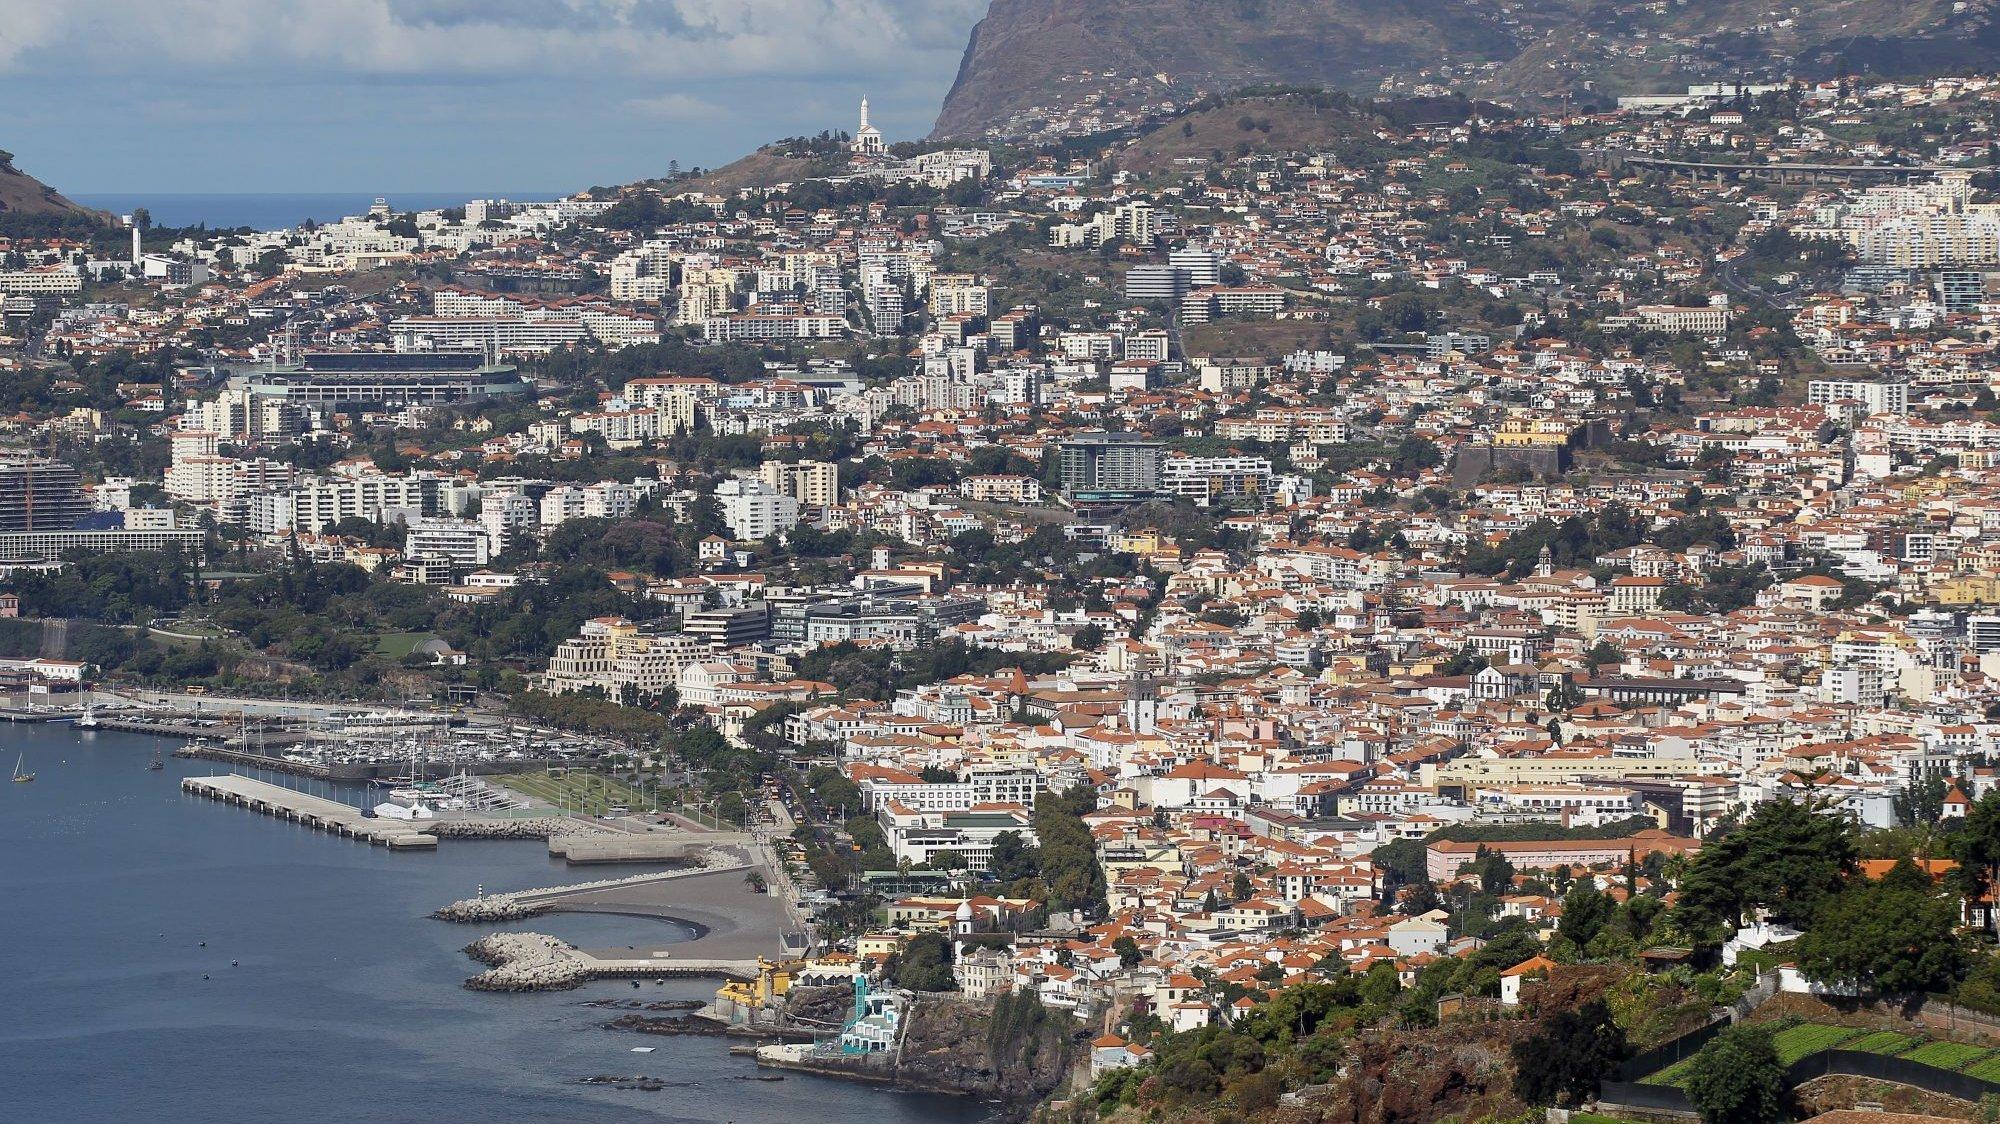 Concelho do Funchal